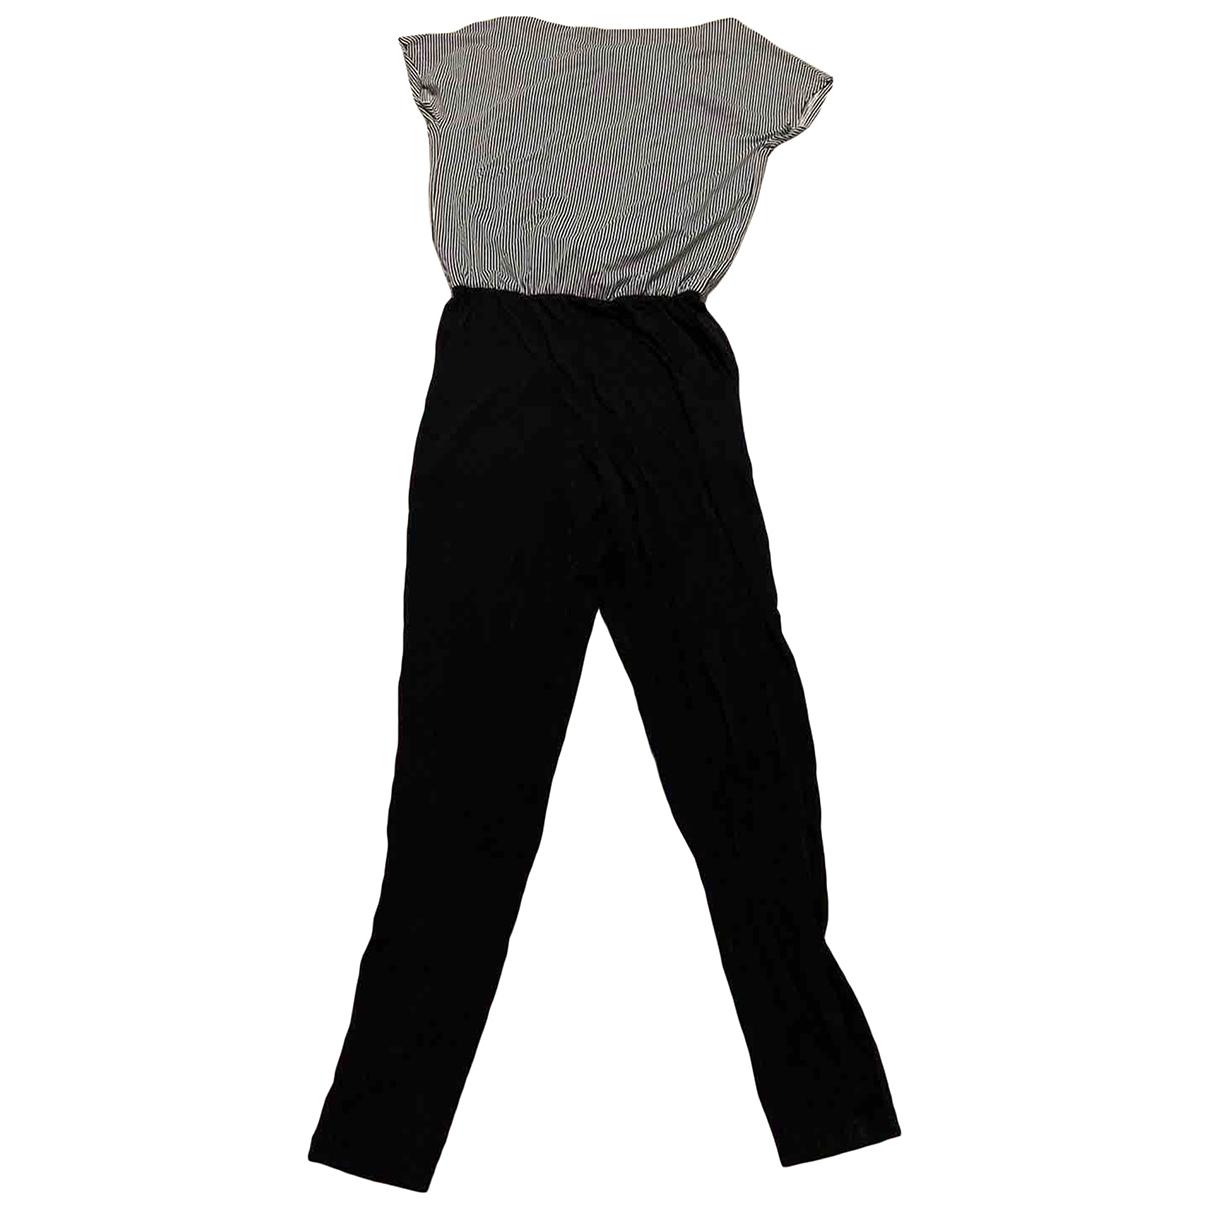 Max & Co \N Black Cotton jumpsuit for Women XS International